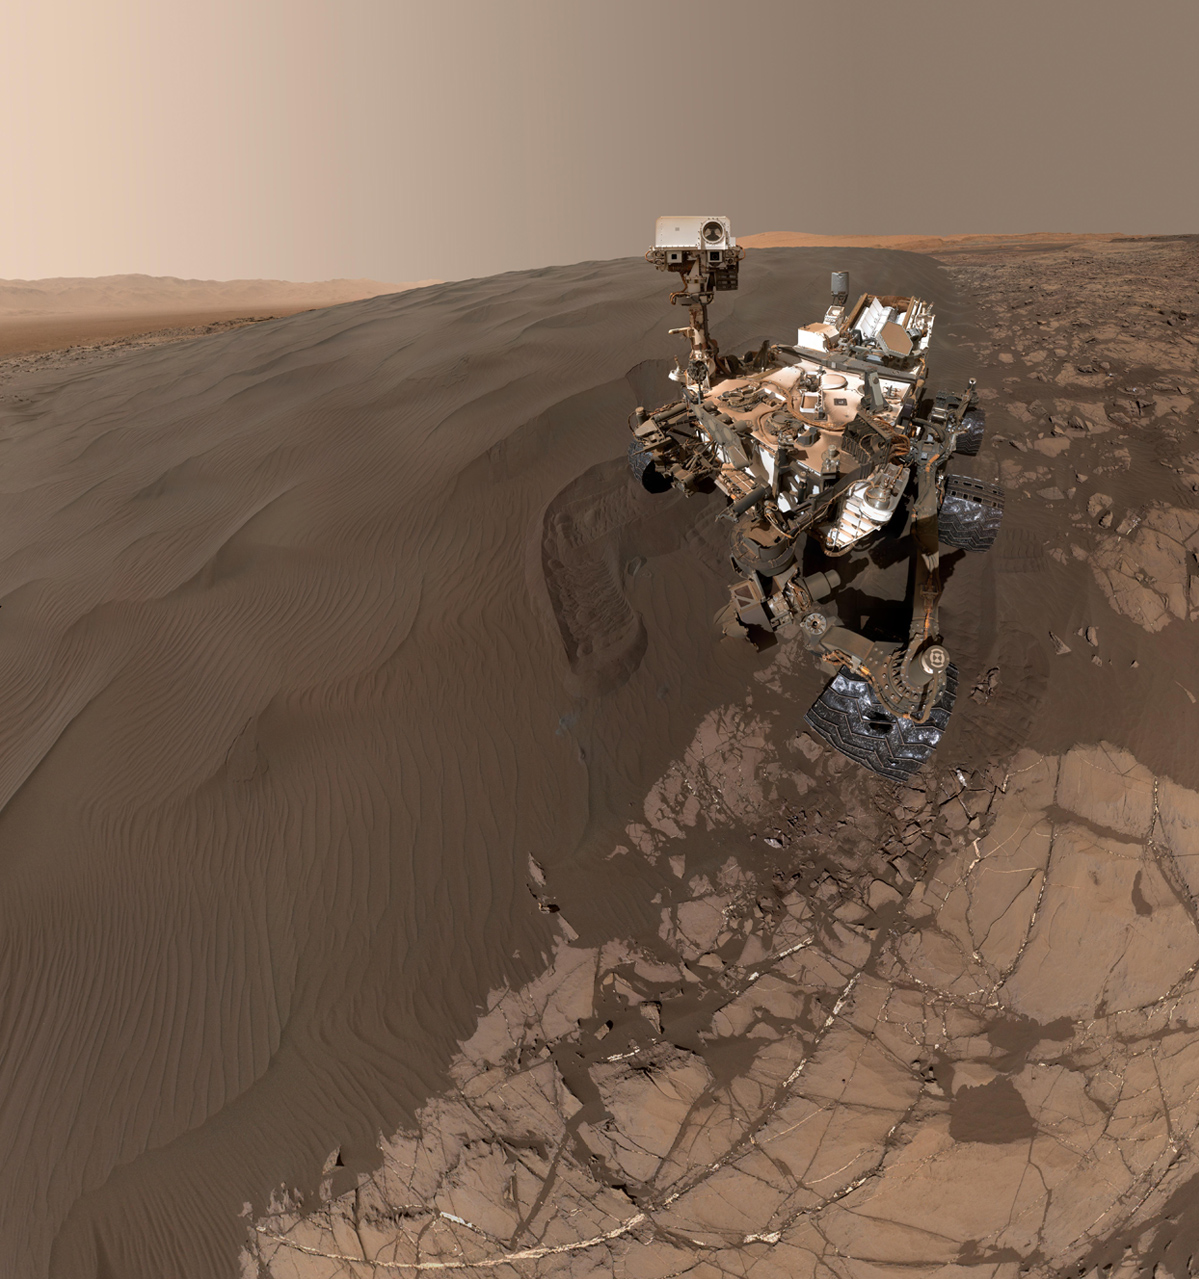 curiostiy mission space - photo #6